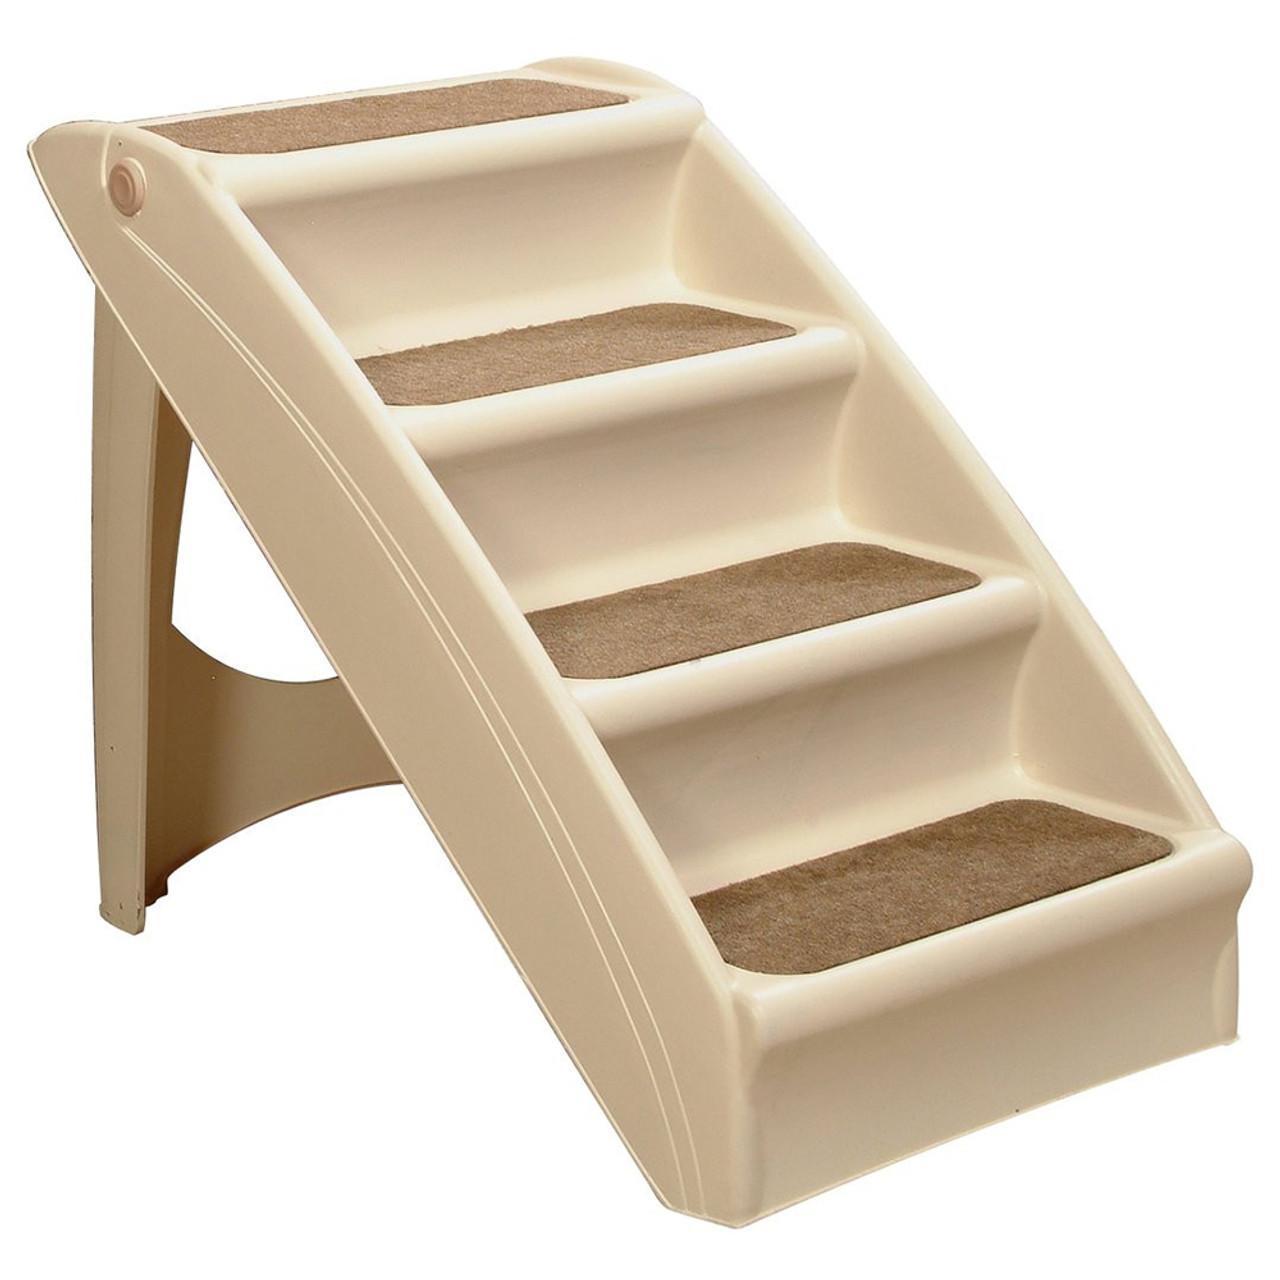 Solvit PupSTEP Plus Pet Staircase